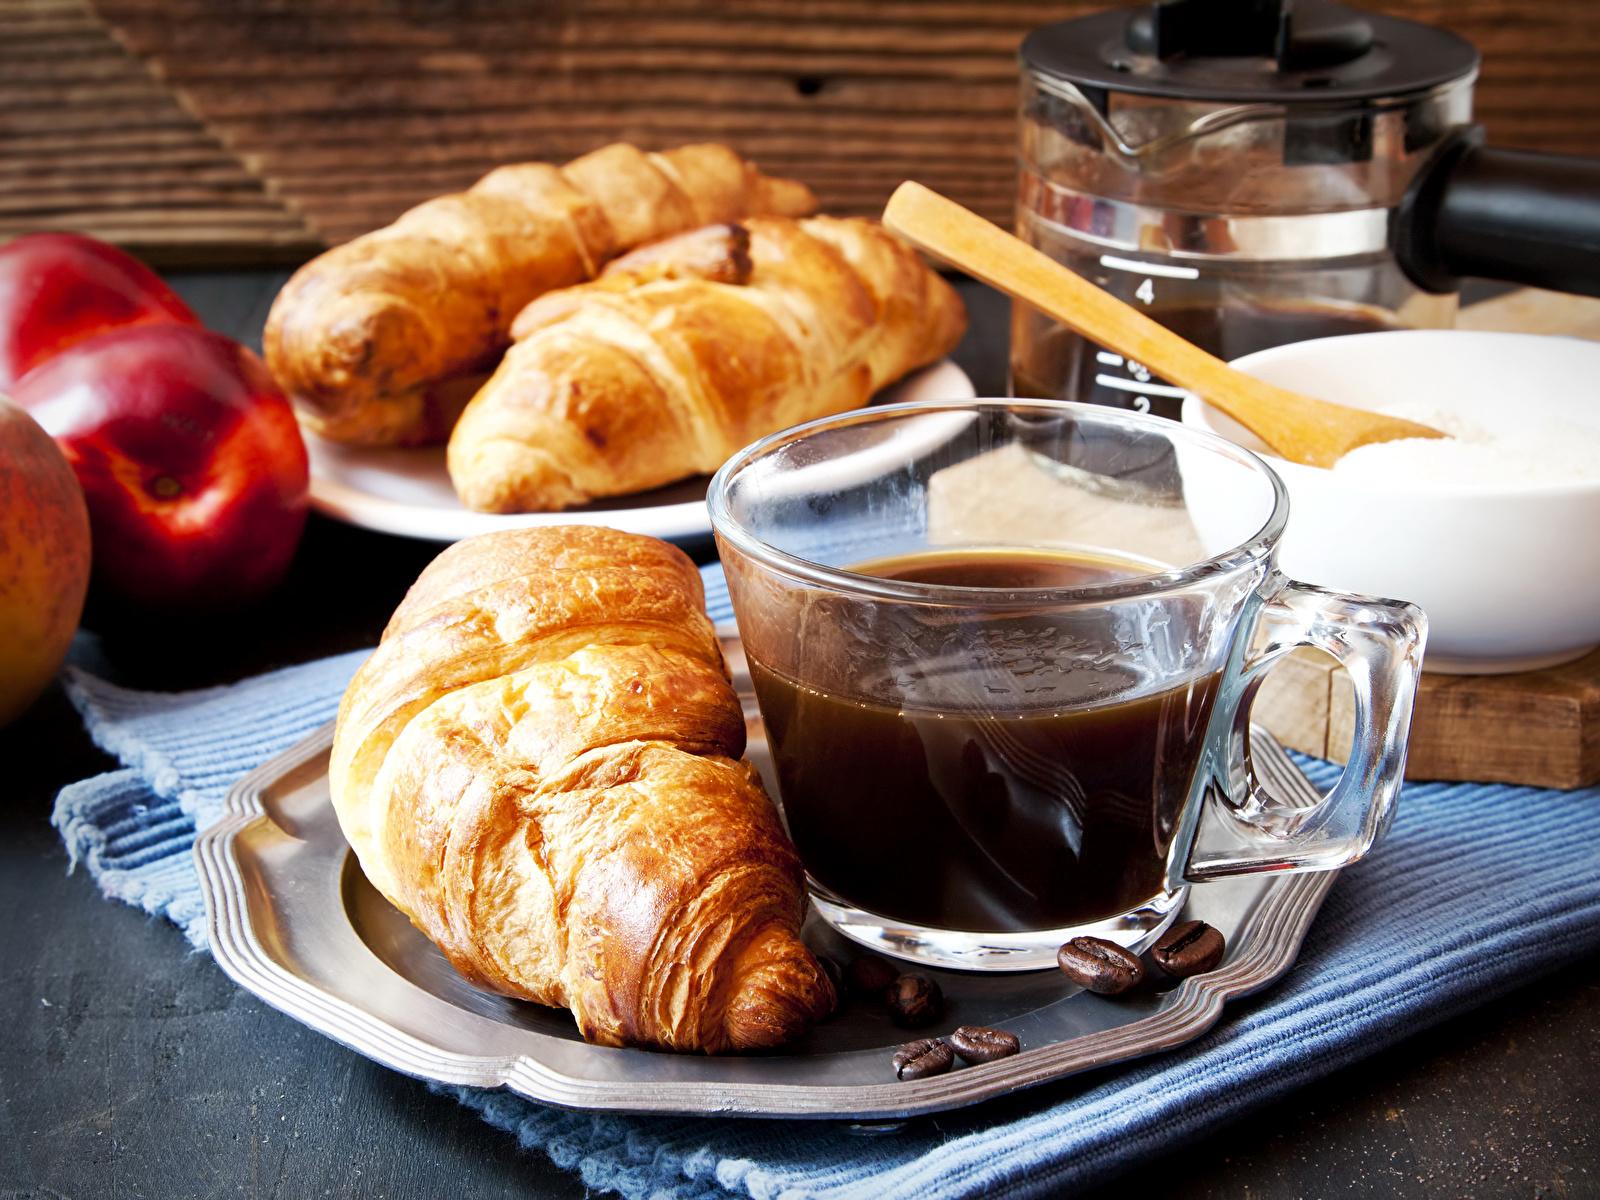 Картинки Кофе Круассан Еда чашке Выпечка 1600x1200 Пища Чашка Продукты питания